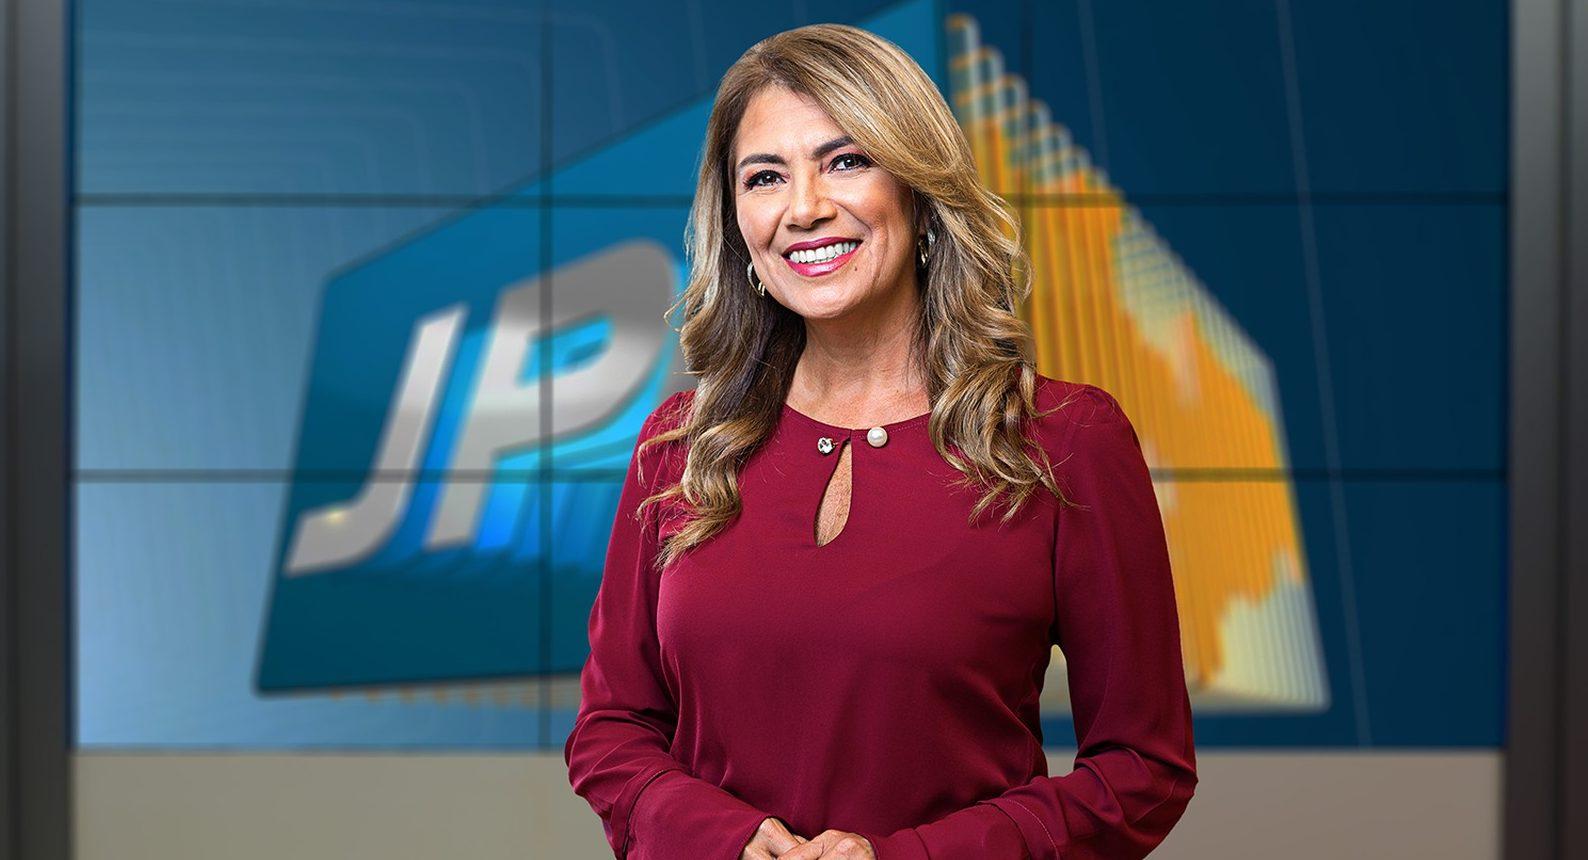 Edilane Araújo – Apresentadora deixa bancada do JPB 2ª Edição da TV Cabo Branco após 32 anos